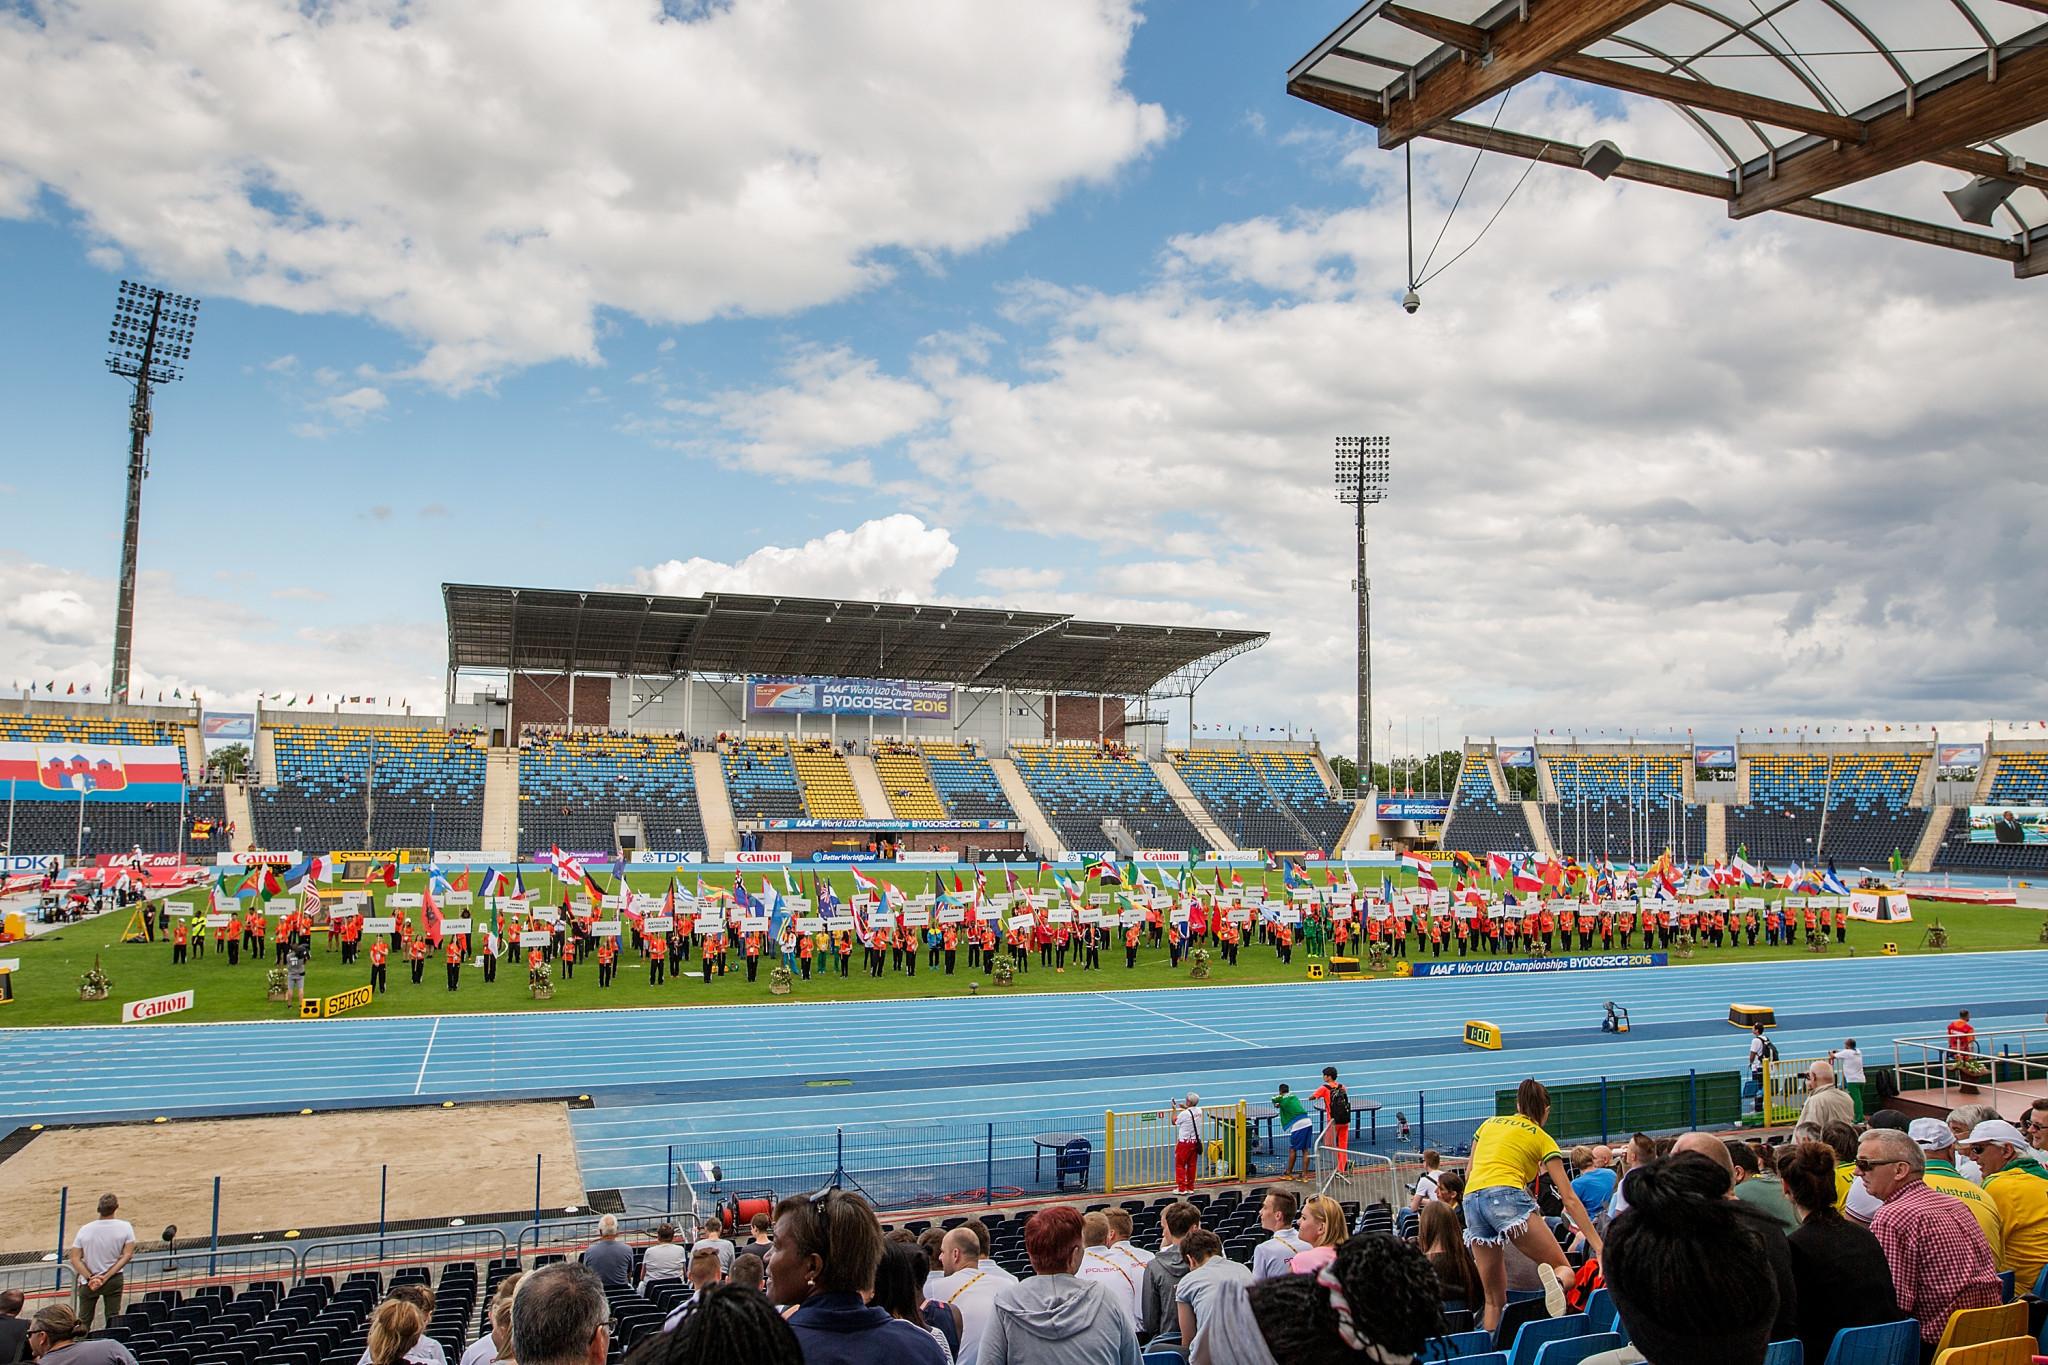 The 2020 World Para Athletics European Championships are due to take place at Bydgoszcz's Zdzisław Krzyszkowiak Stadium ©Getty Images